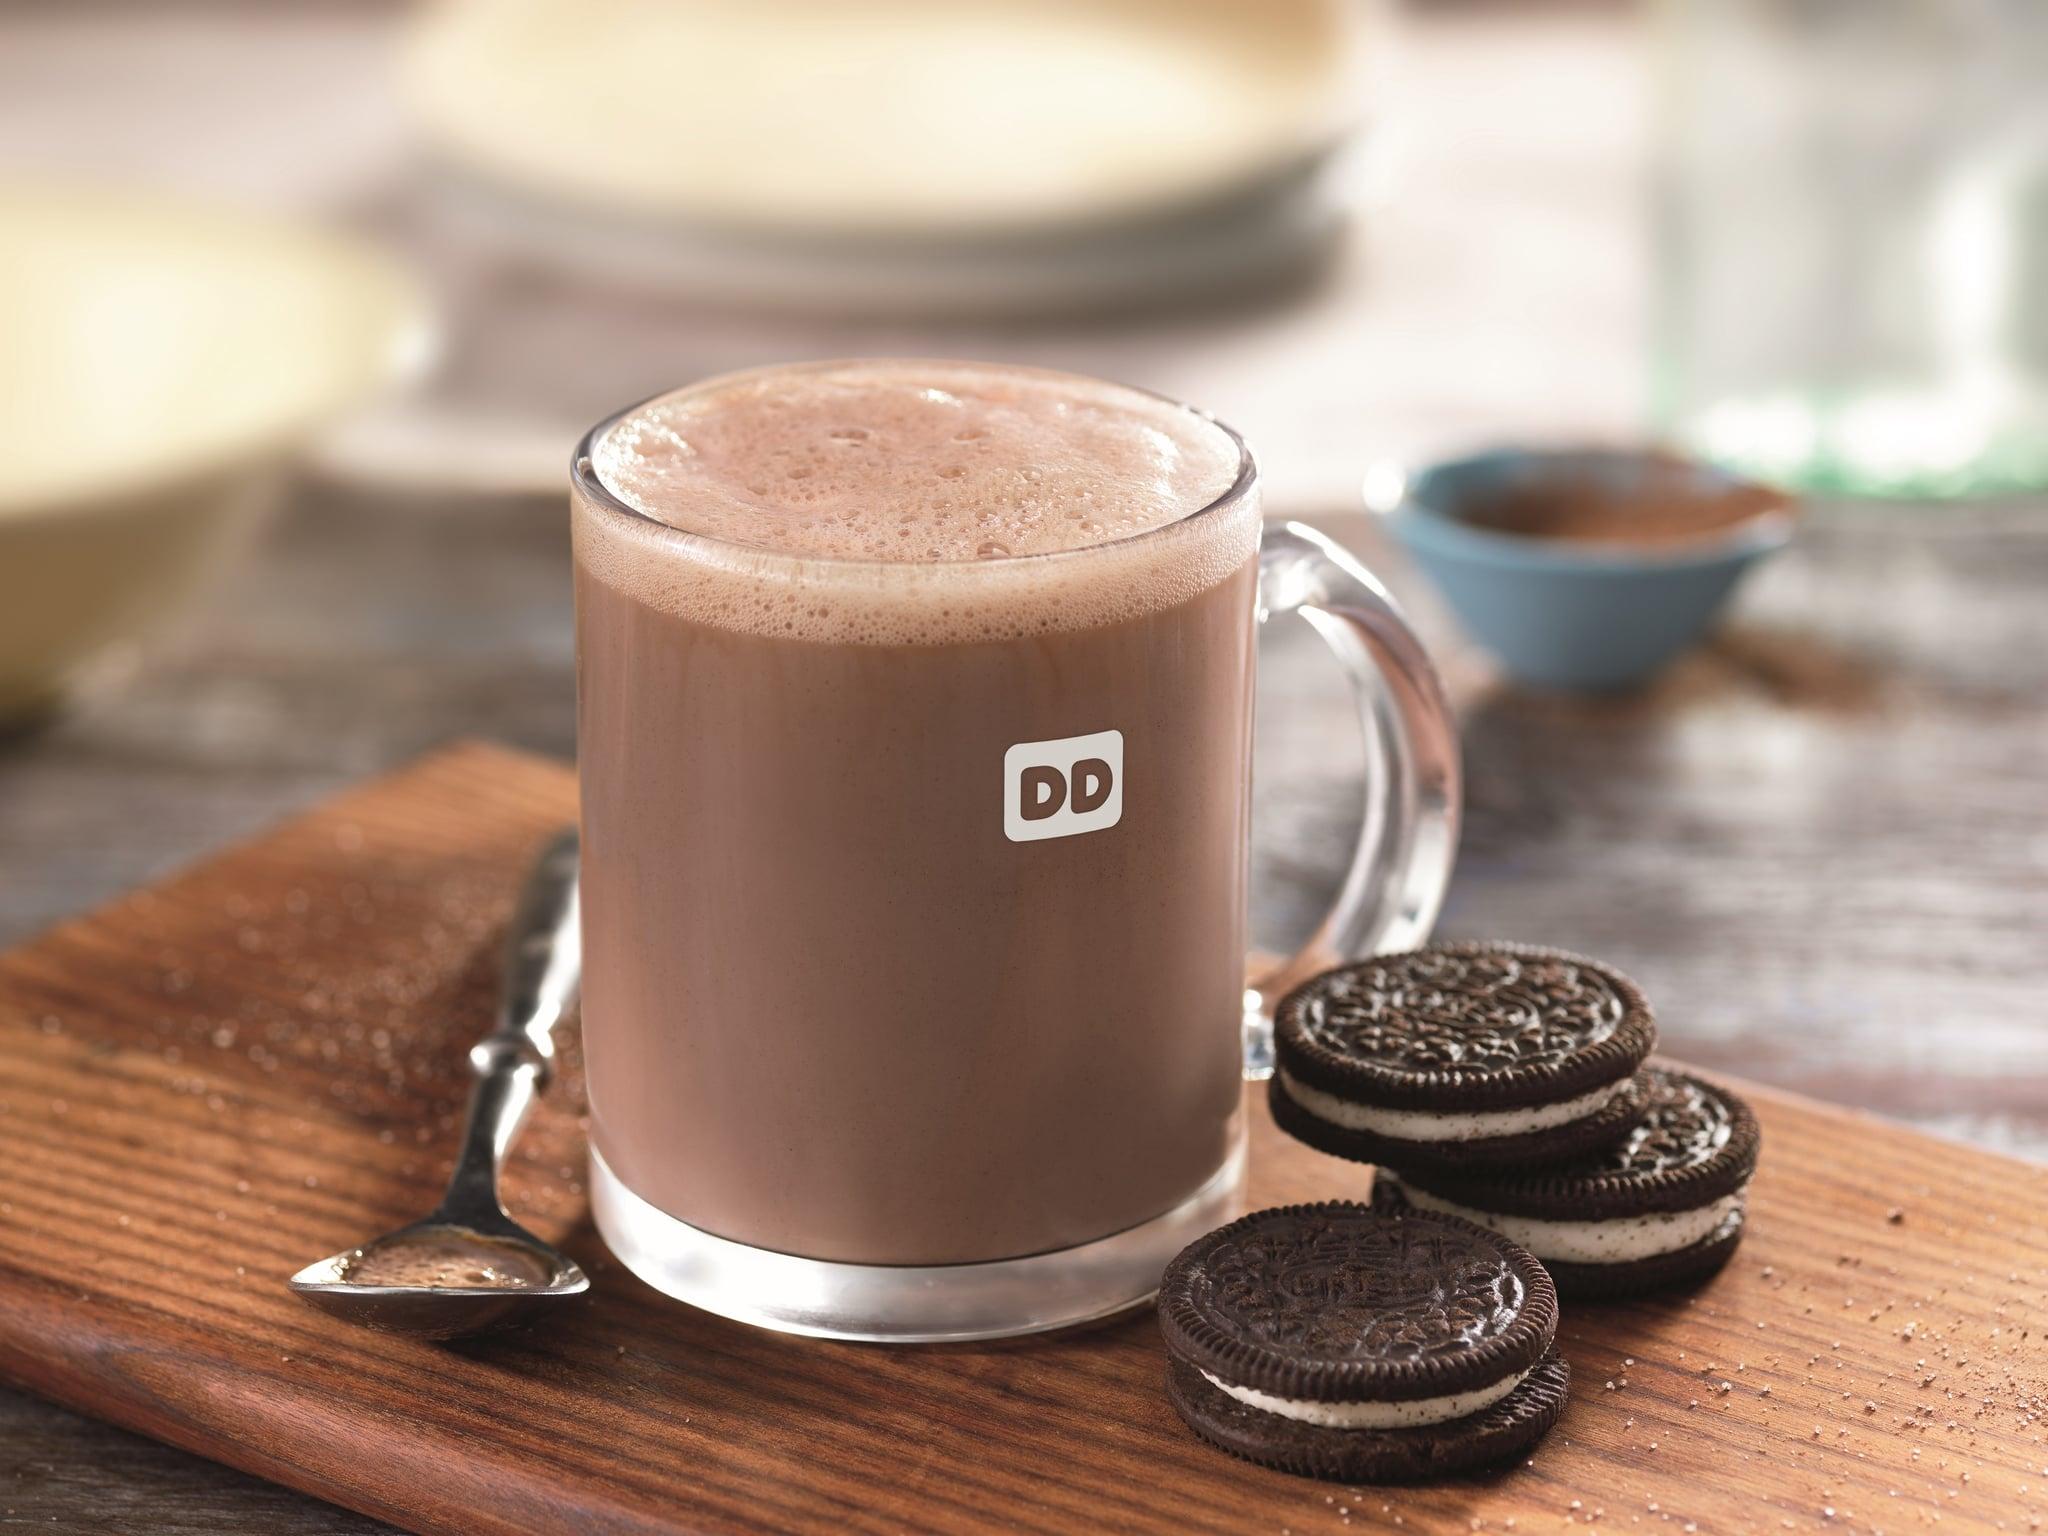 Dunkin Donuts Oreo Hot Chocolate Popsugar Food